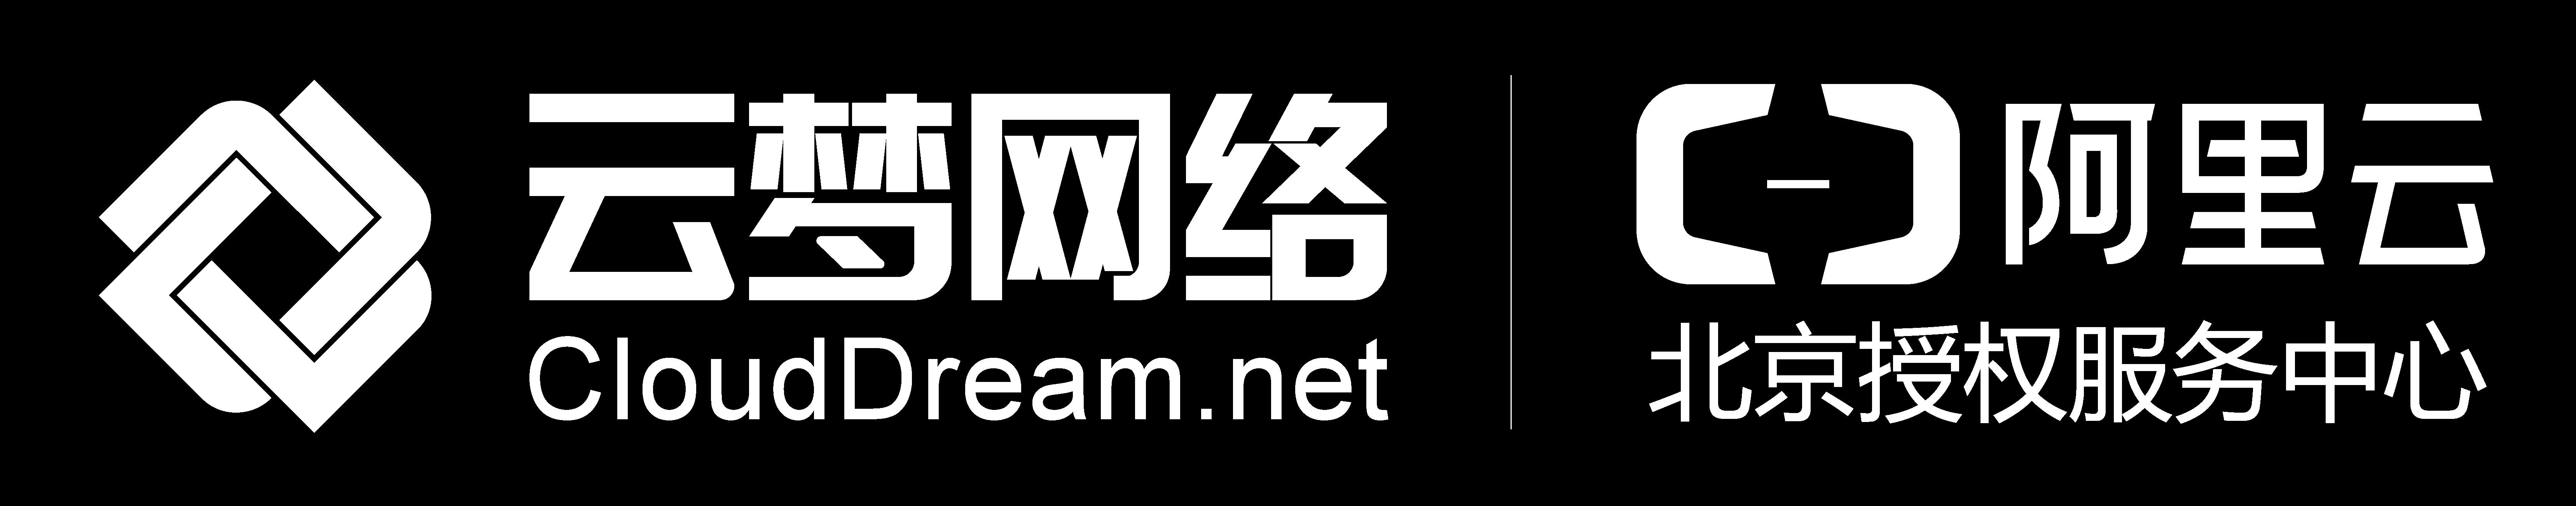 logo大白